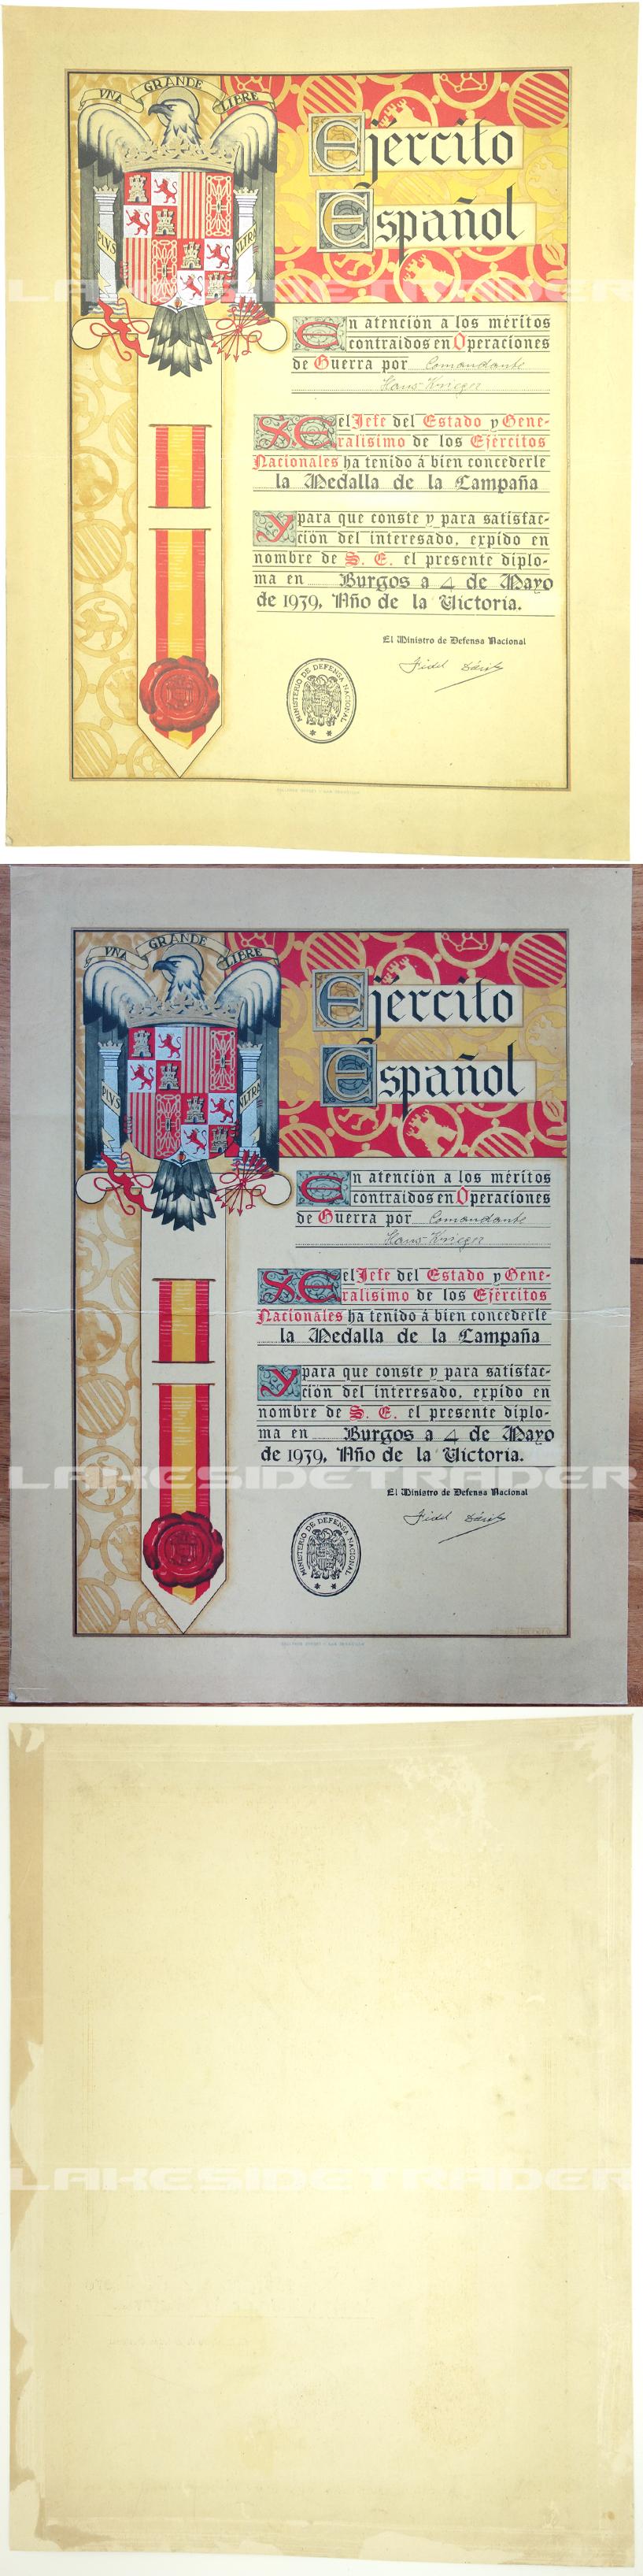 Spanish Civil War Campaign Medal Award Document